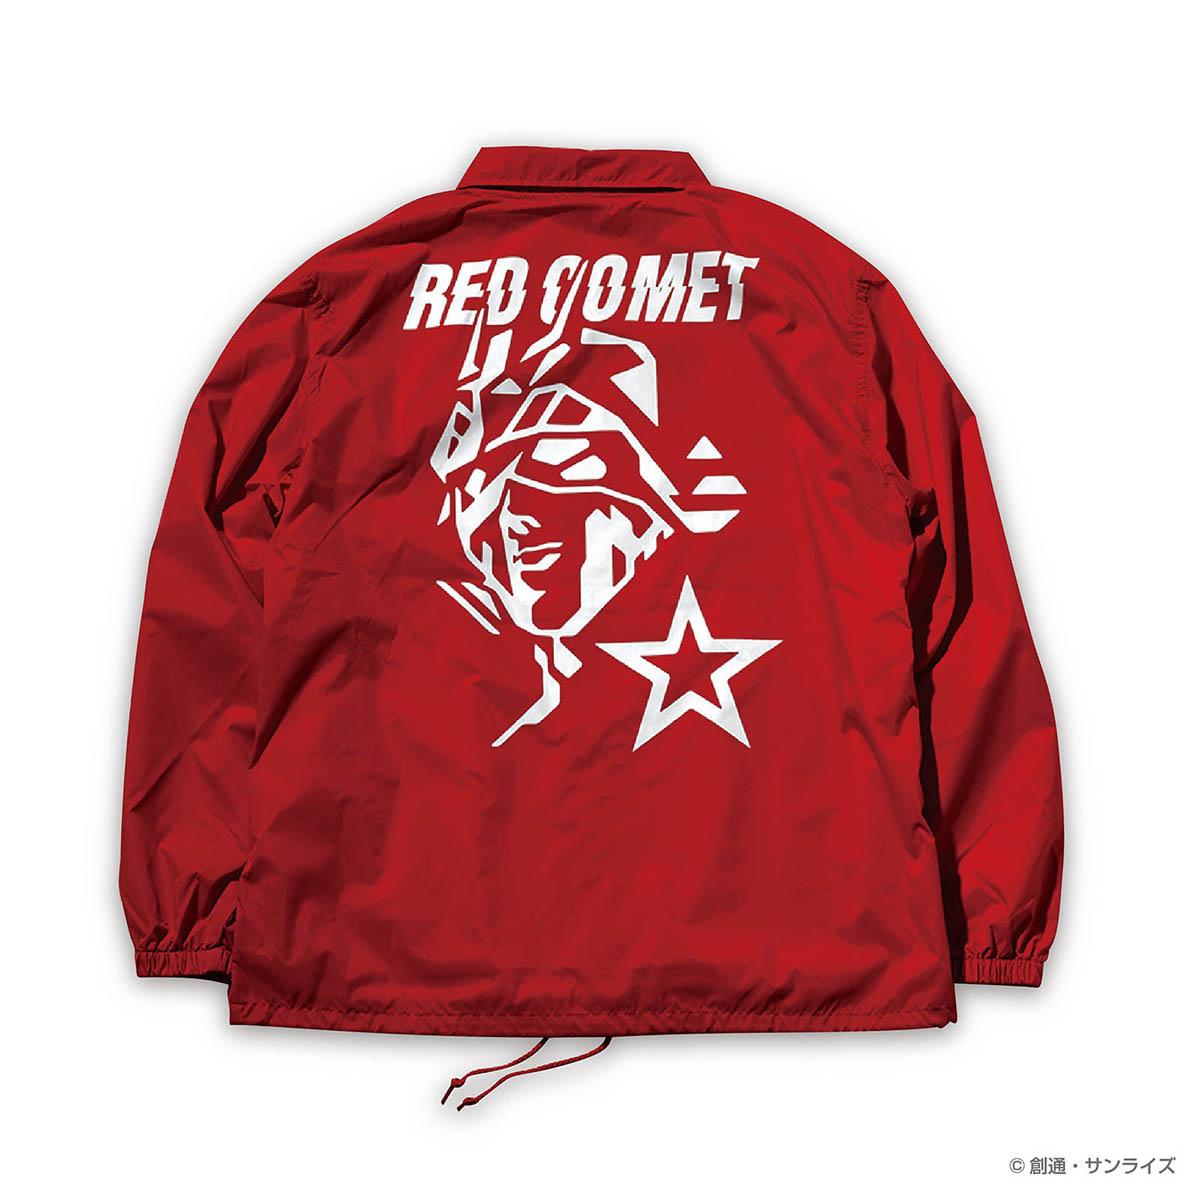 STRICT-G NEW YARK コーチジャケット RED COMET